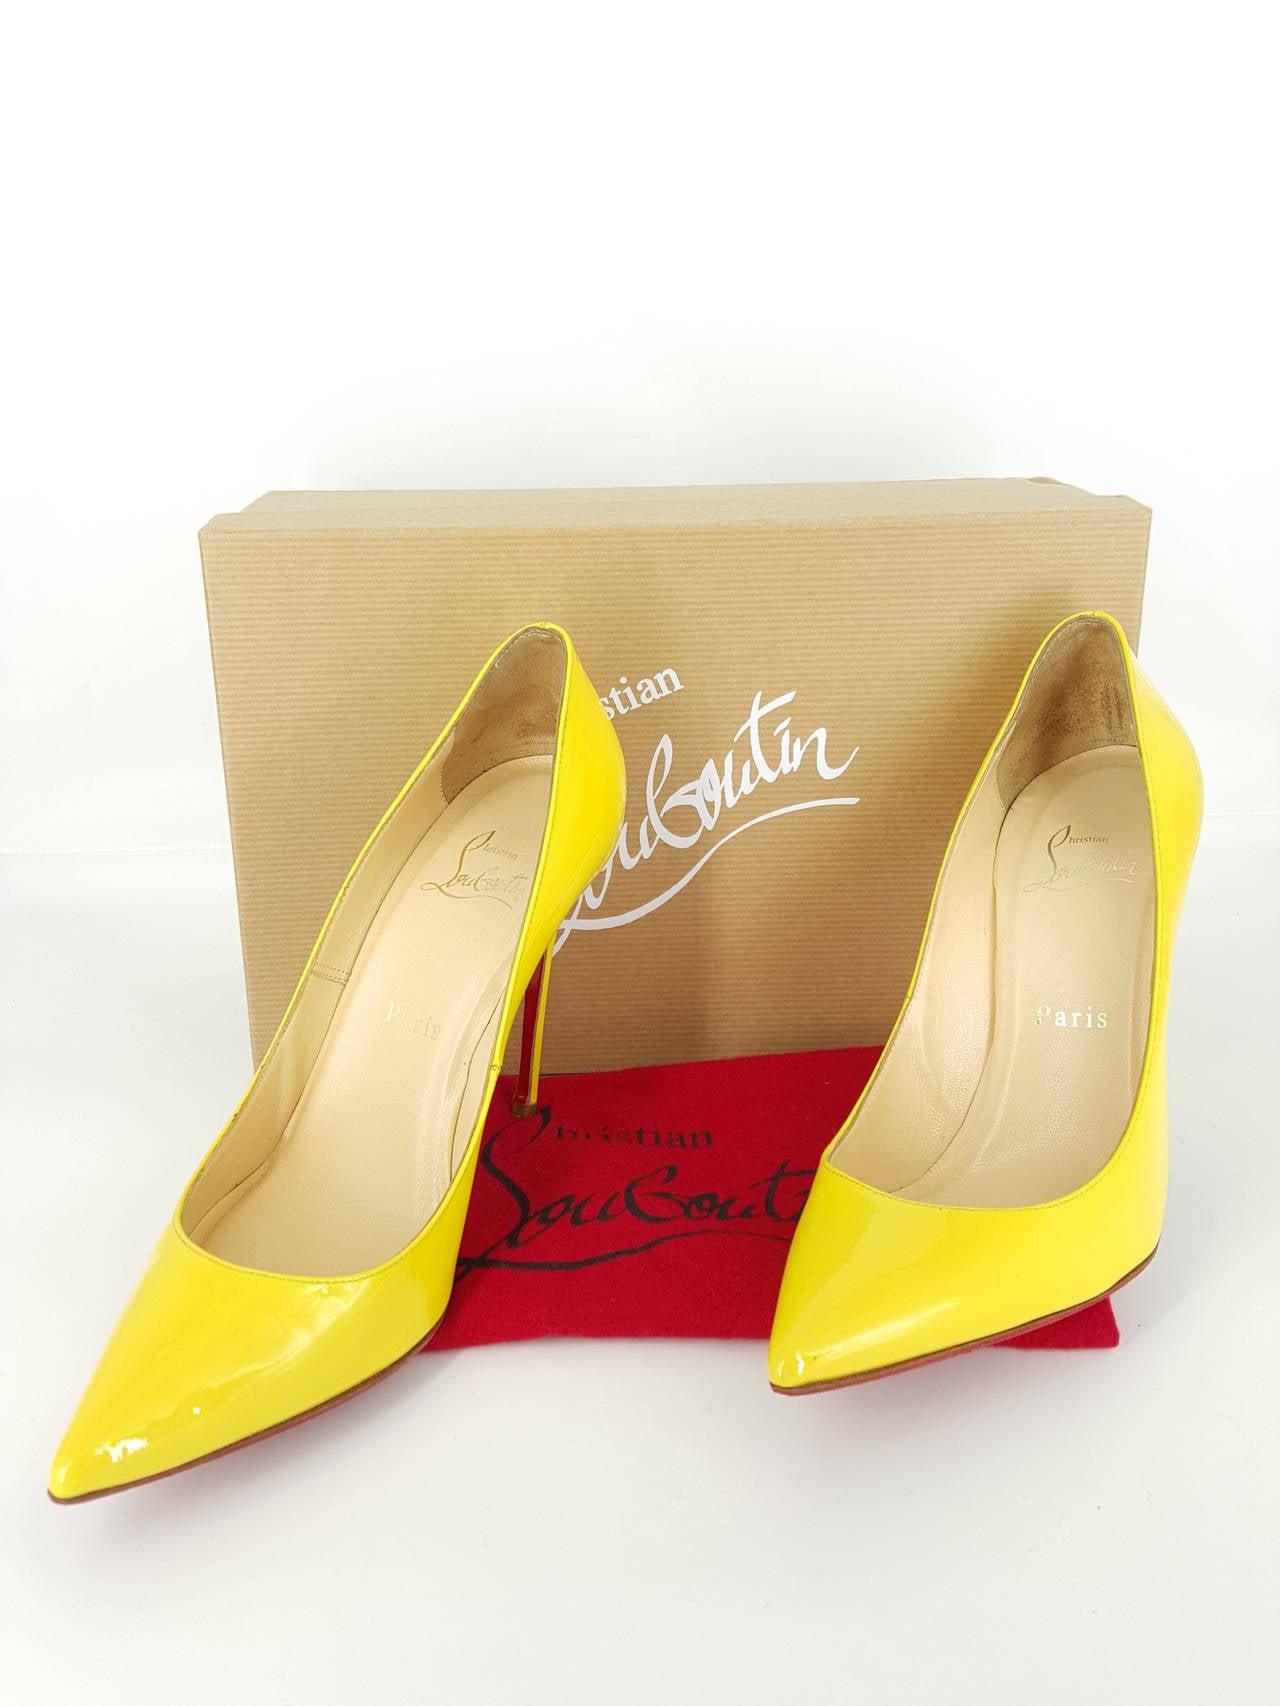 Christian Louboutin Bright Yellow High Heel Pumps Size 38 5